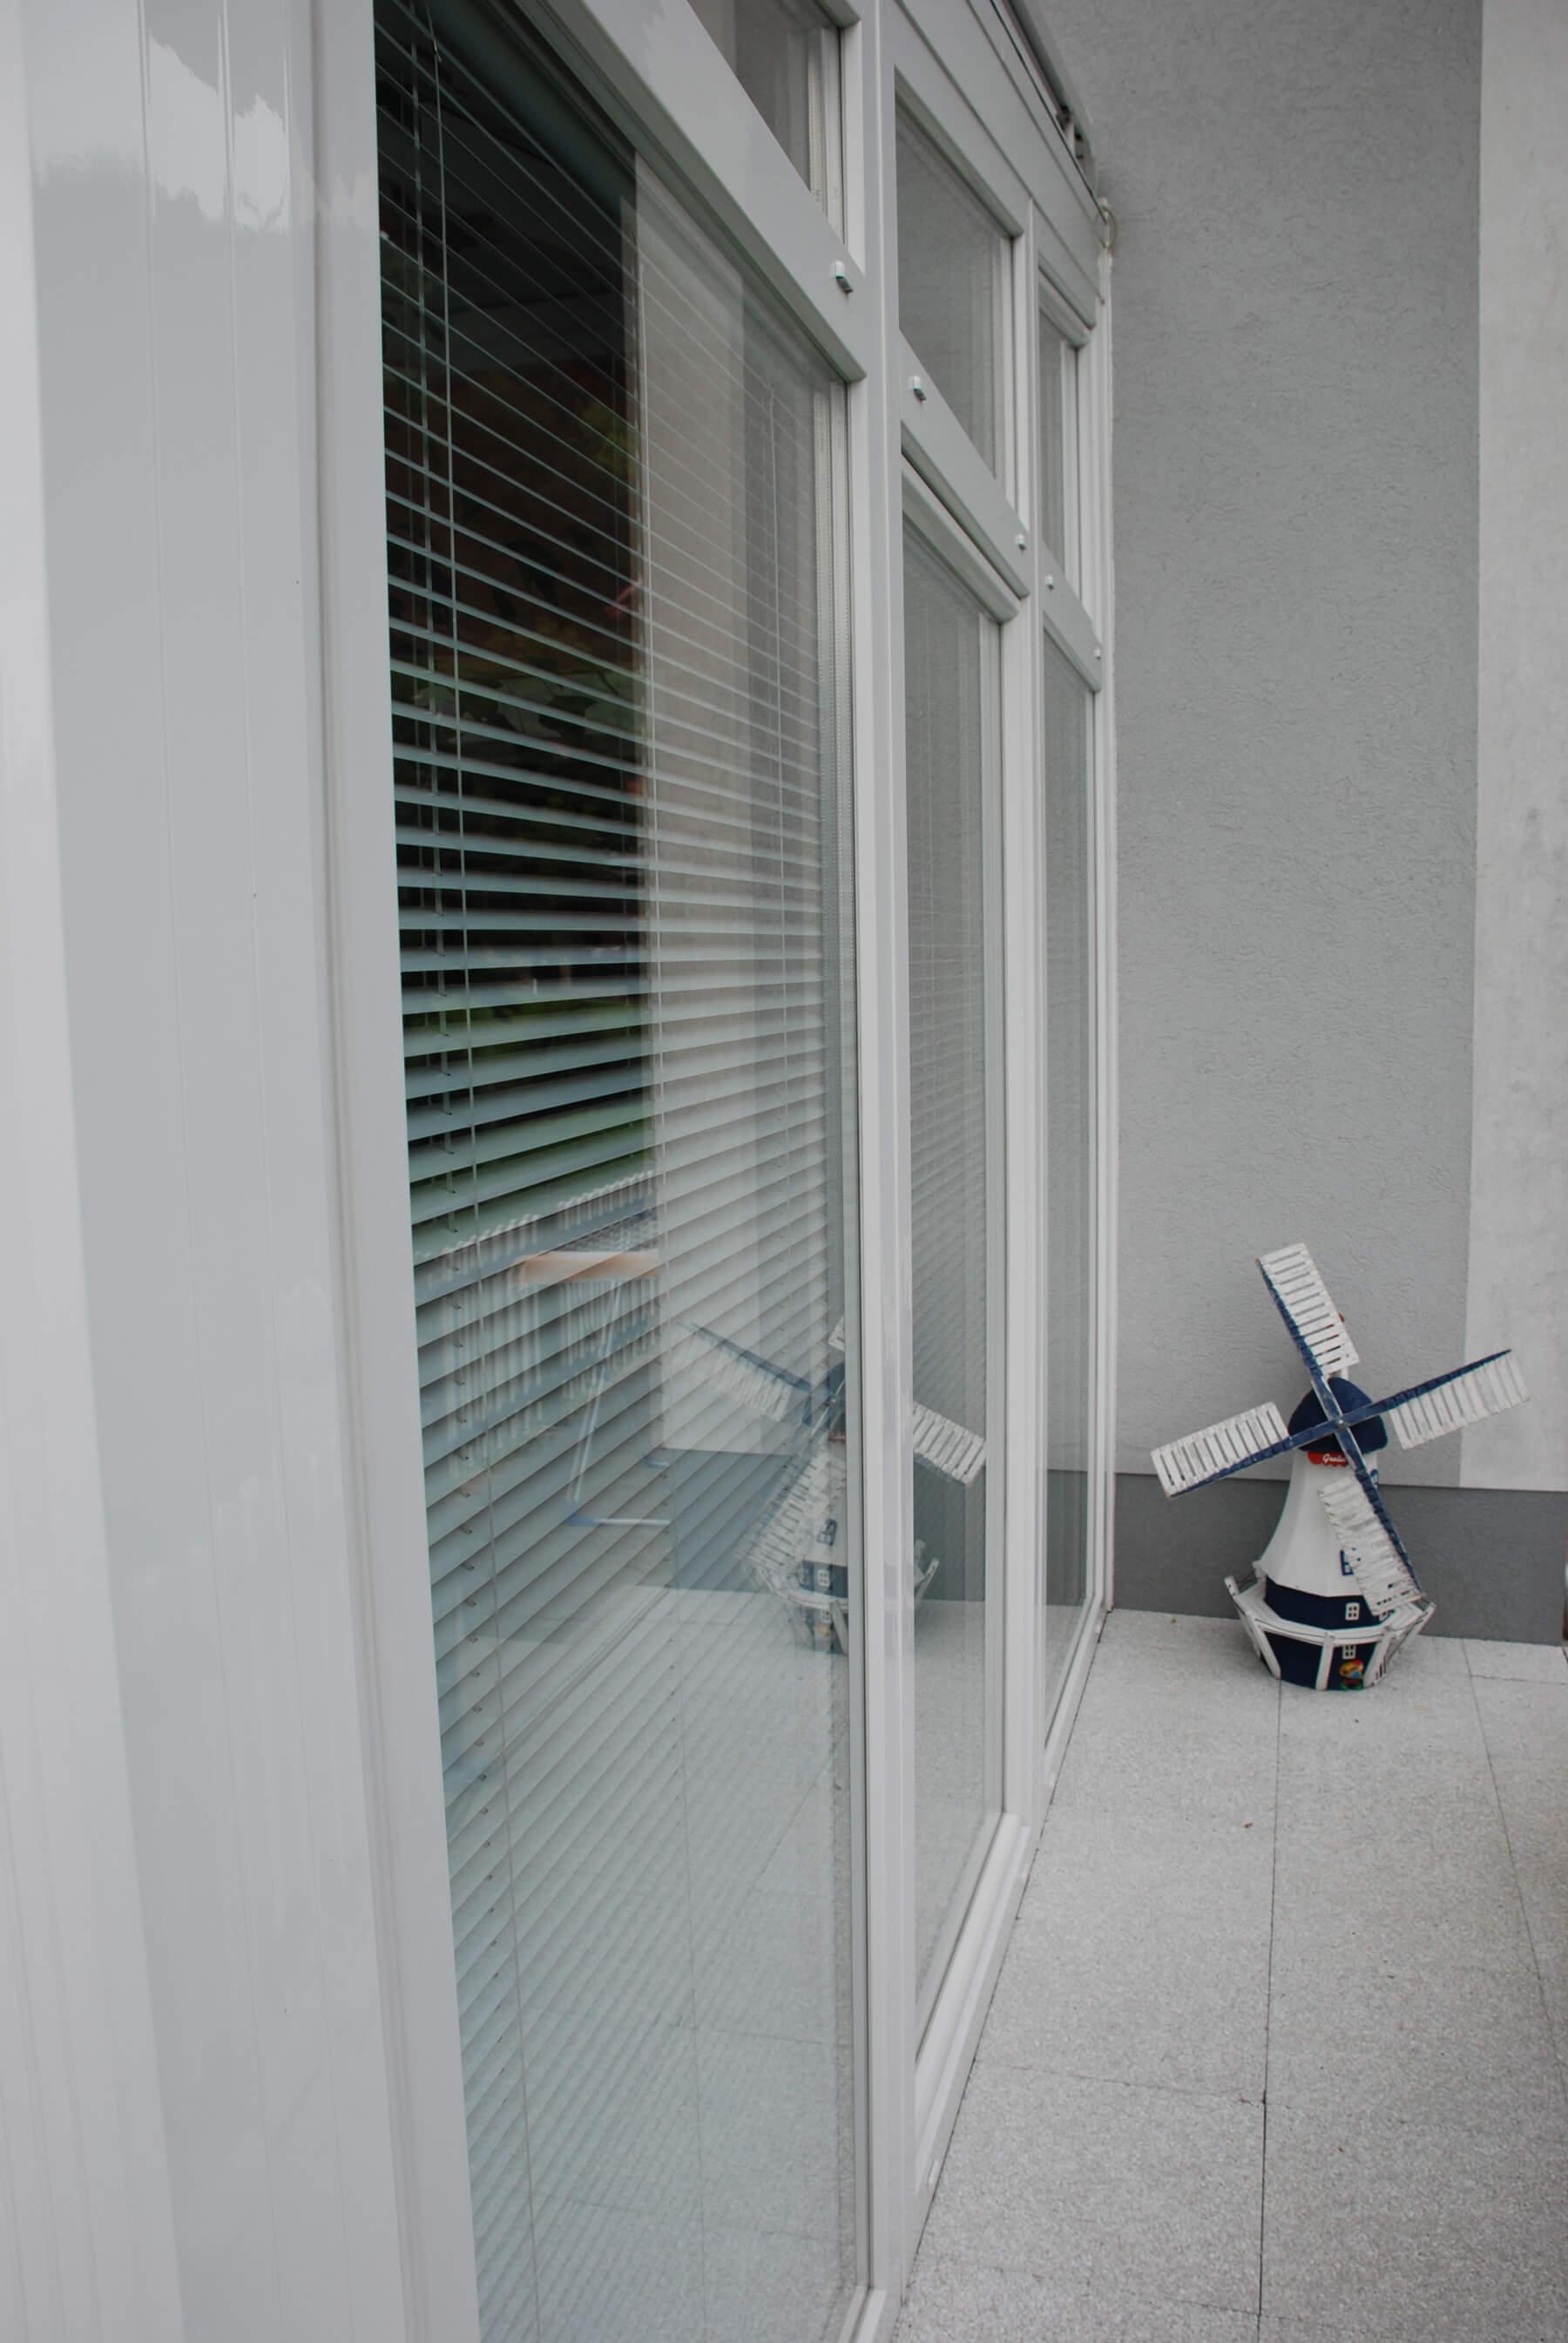 faltt ren terrasse idealer wetterschutz f r den au enbereich. Black Bedroom Furniture Sets. Home Design Ideas